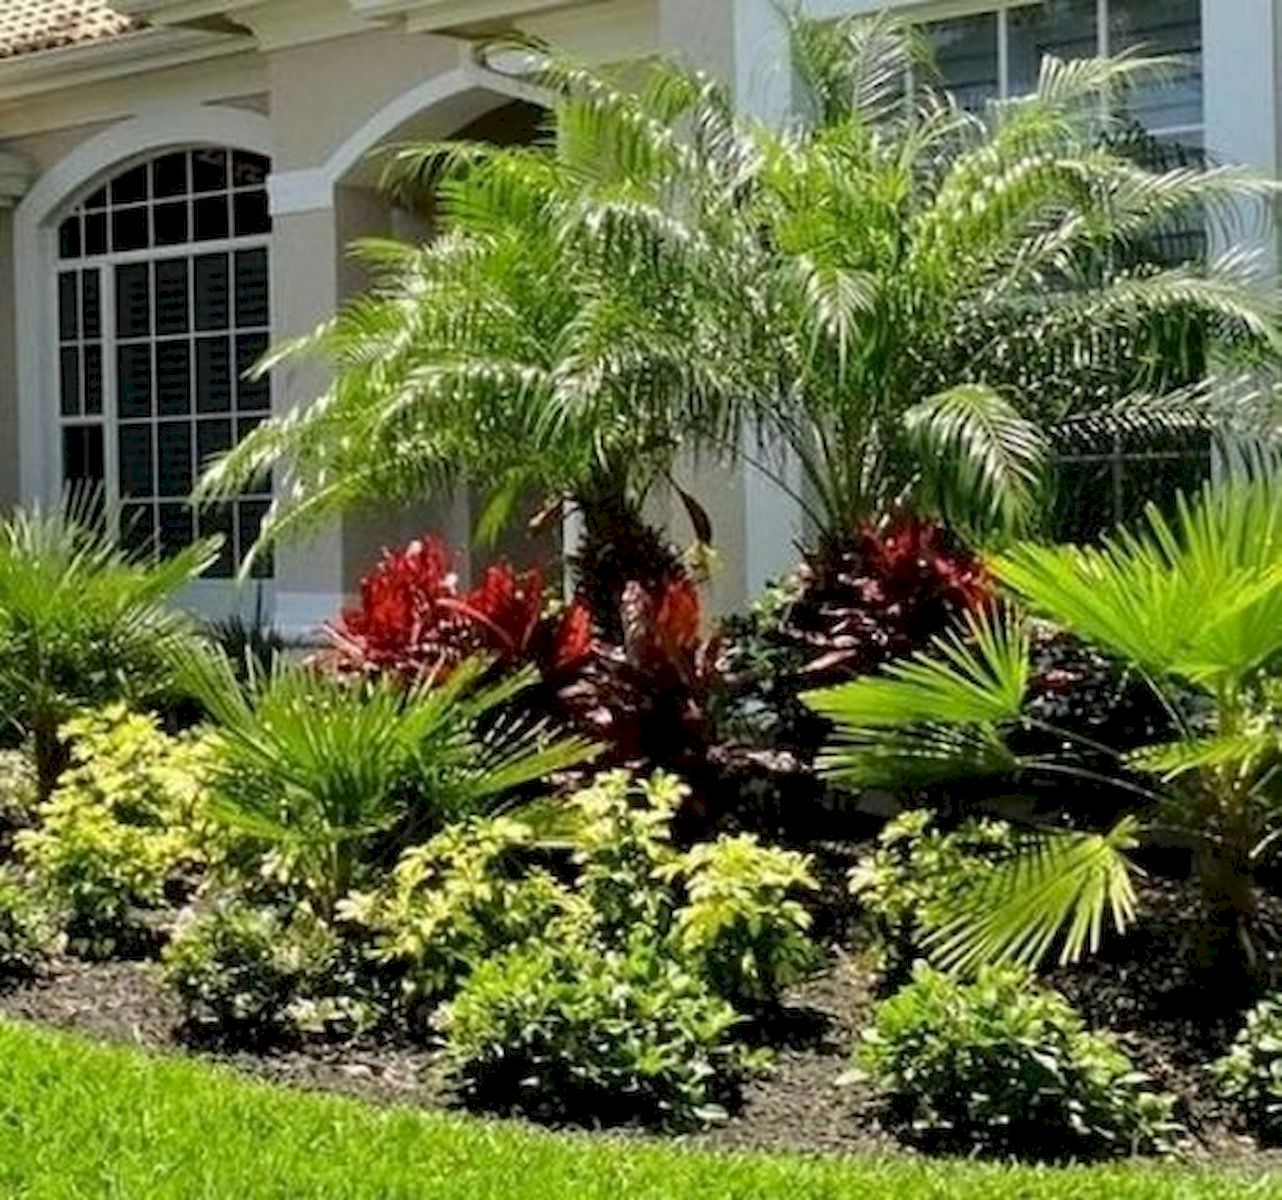 48 Stunning Front Yard Landscaping Ideas That Make Beautiful Garden (19)